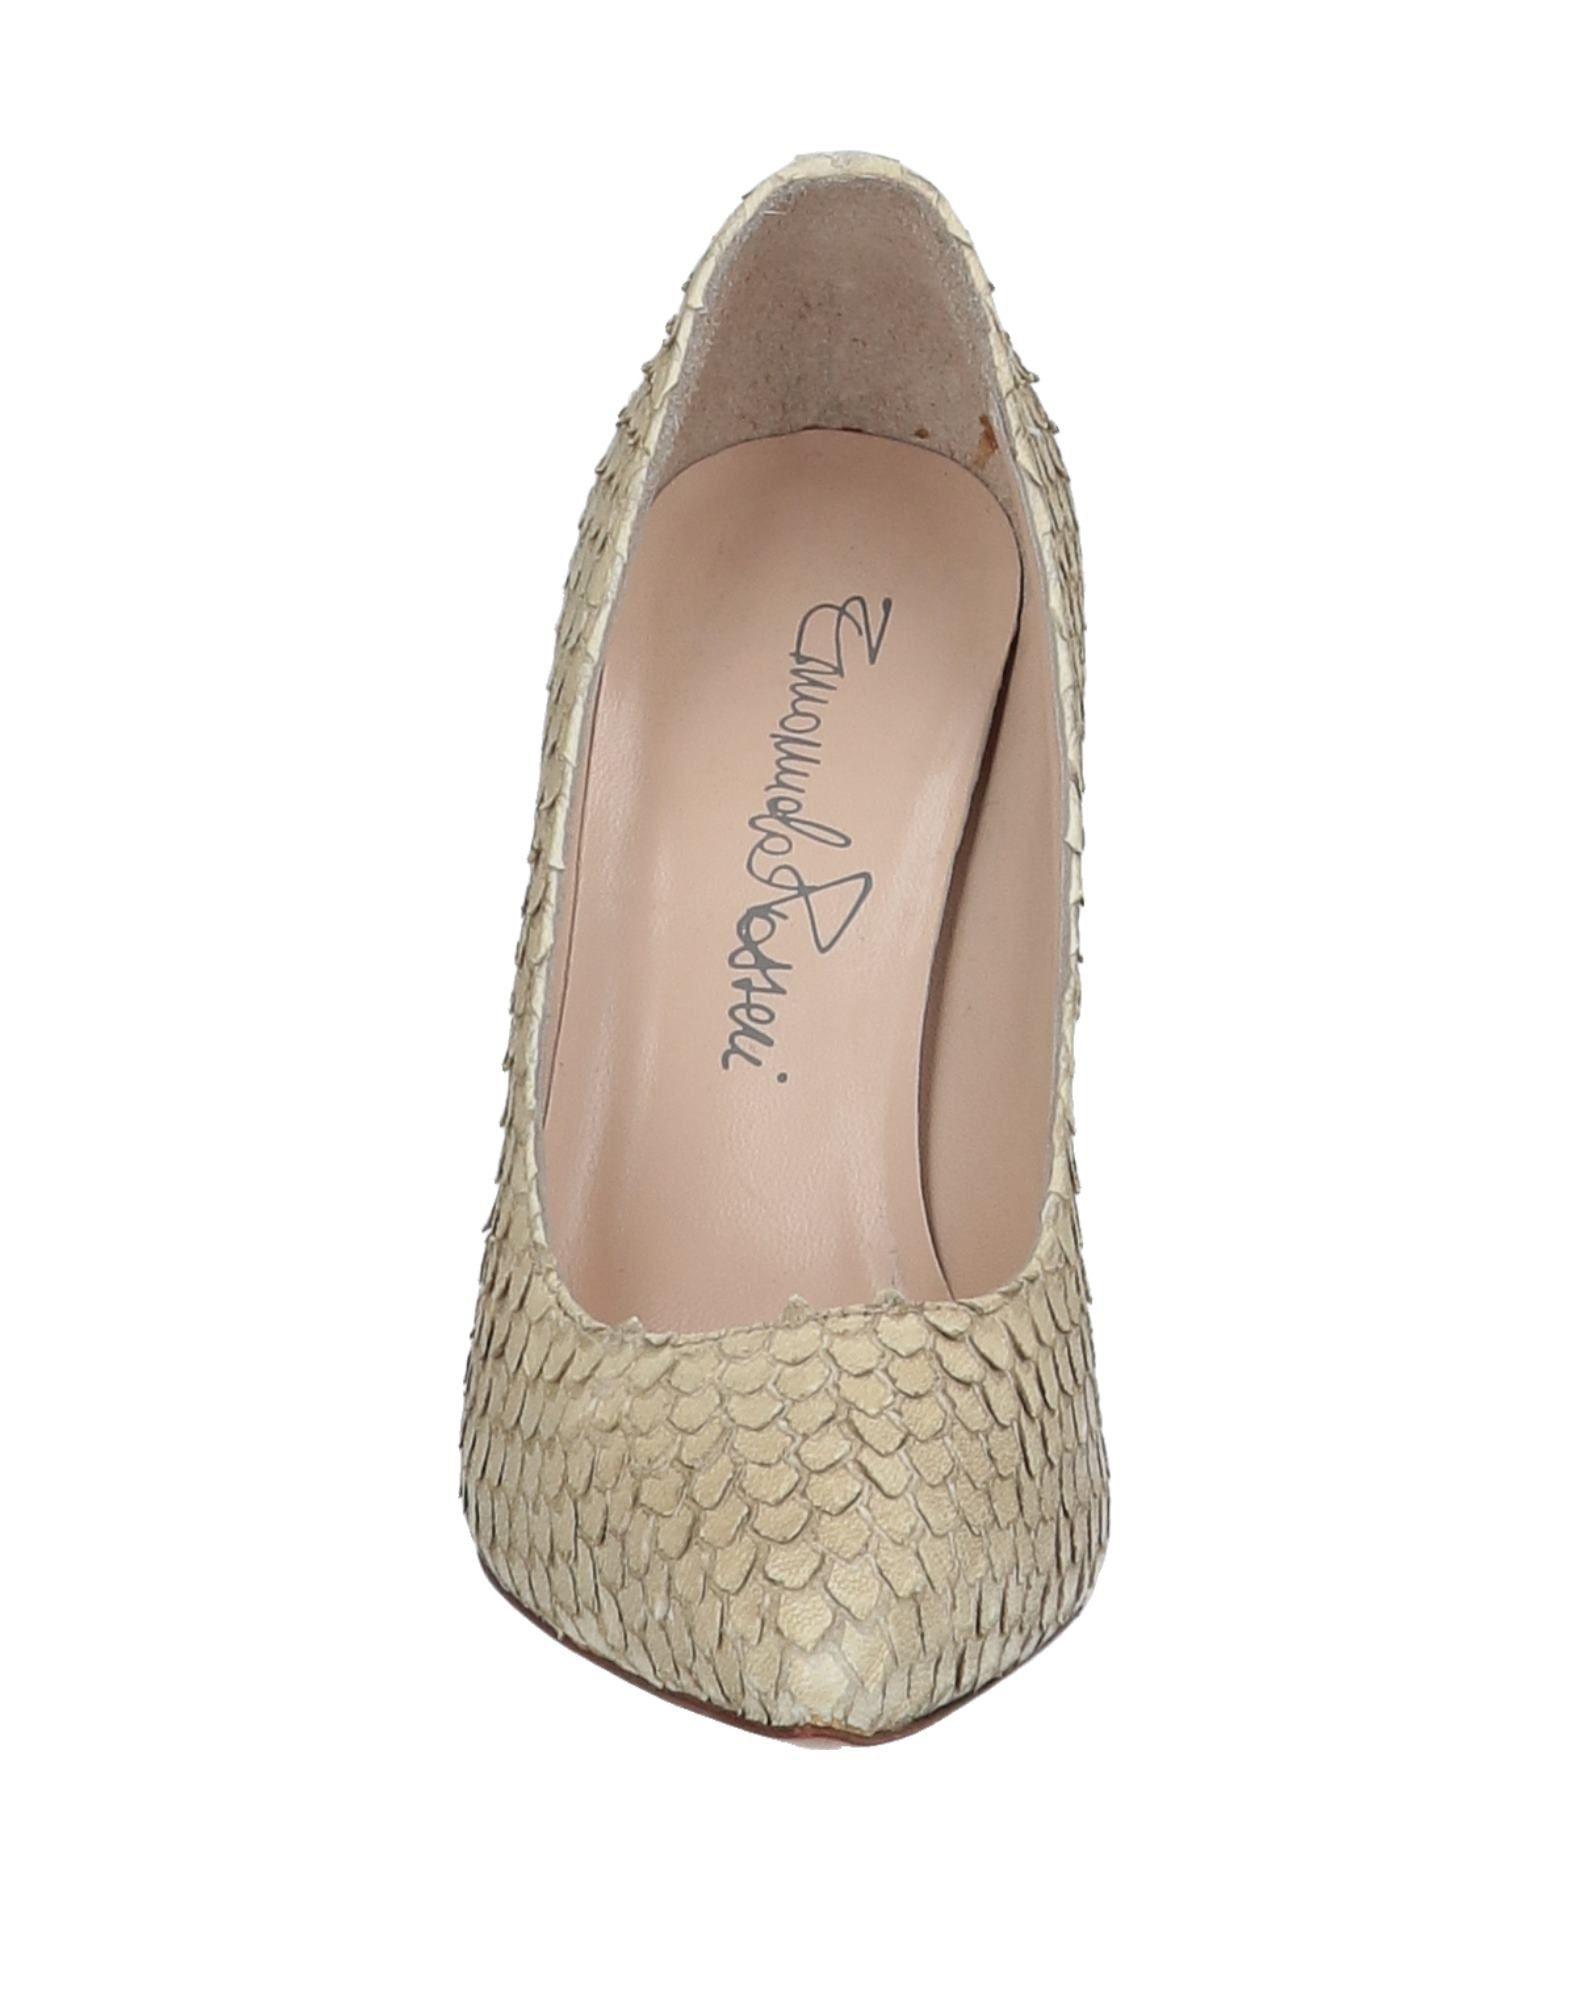 Emanuela 11508430AP Passeri Pumps Damen  11508430AP Emanuela Gute Qualität beliebte Schuhe 934ad8